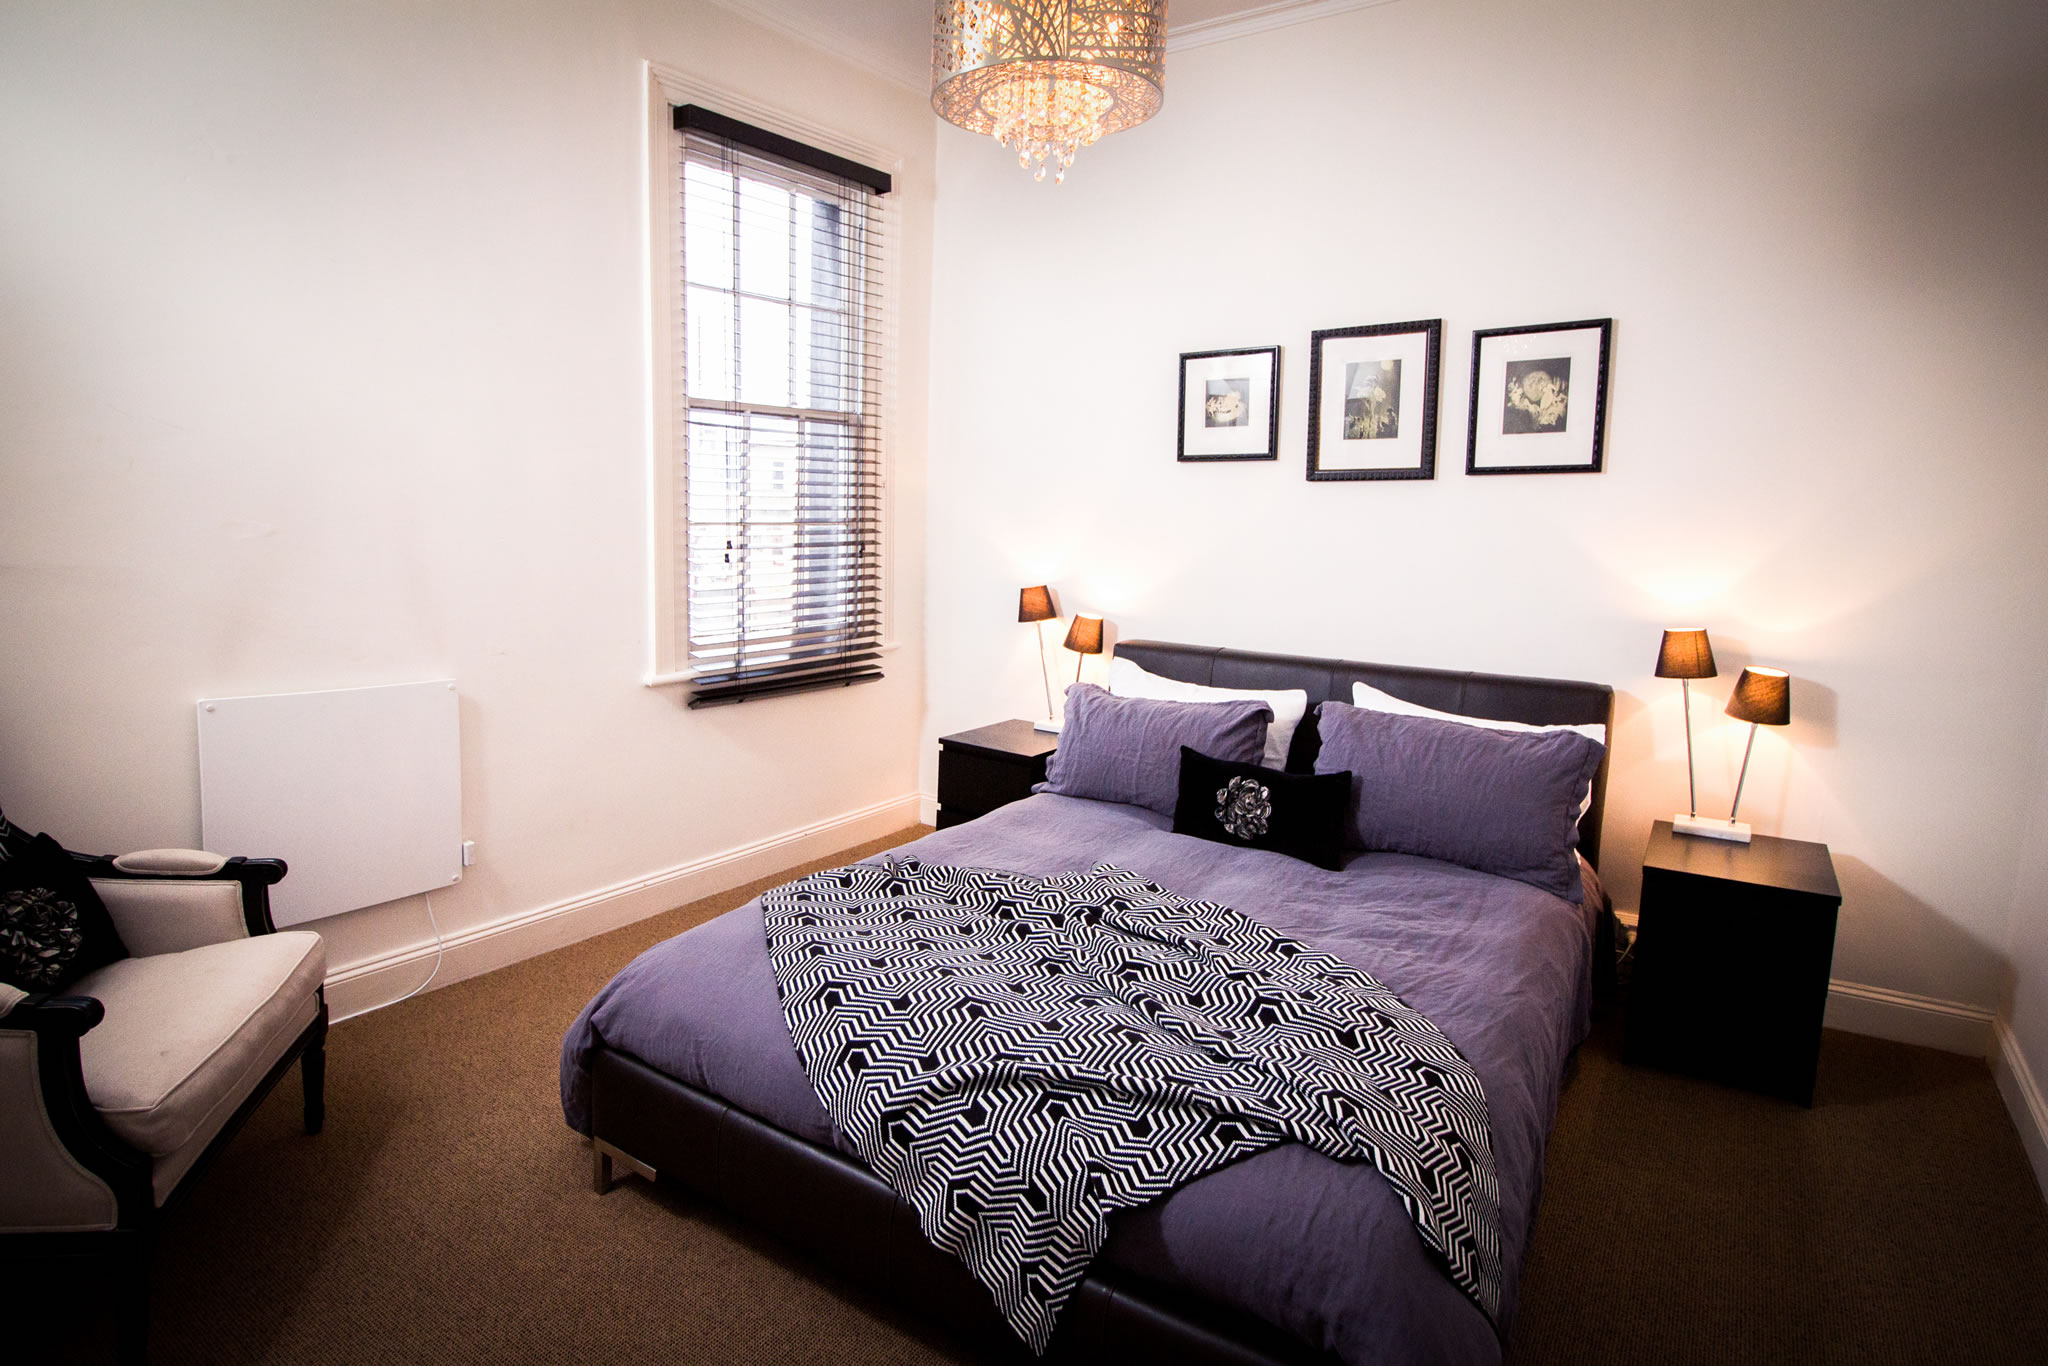 Bed Room One WIDE-1.jpg